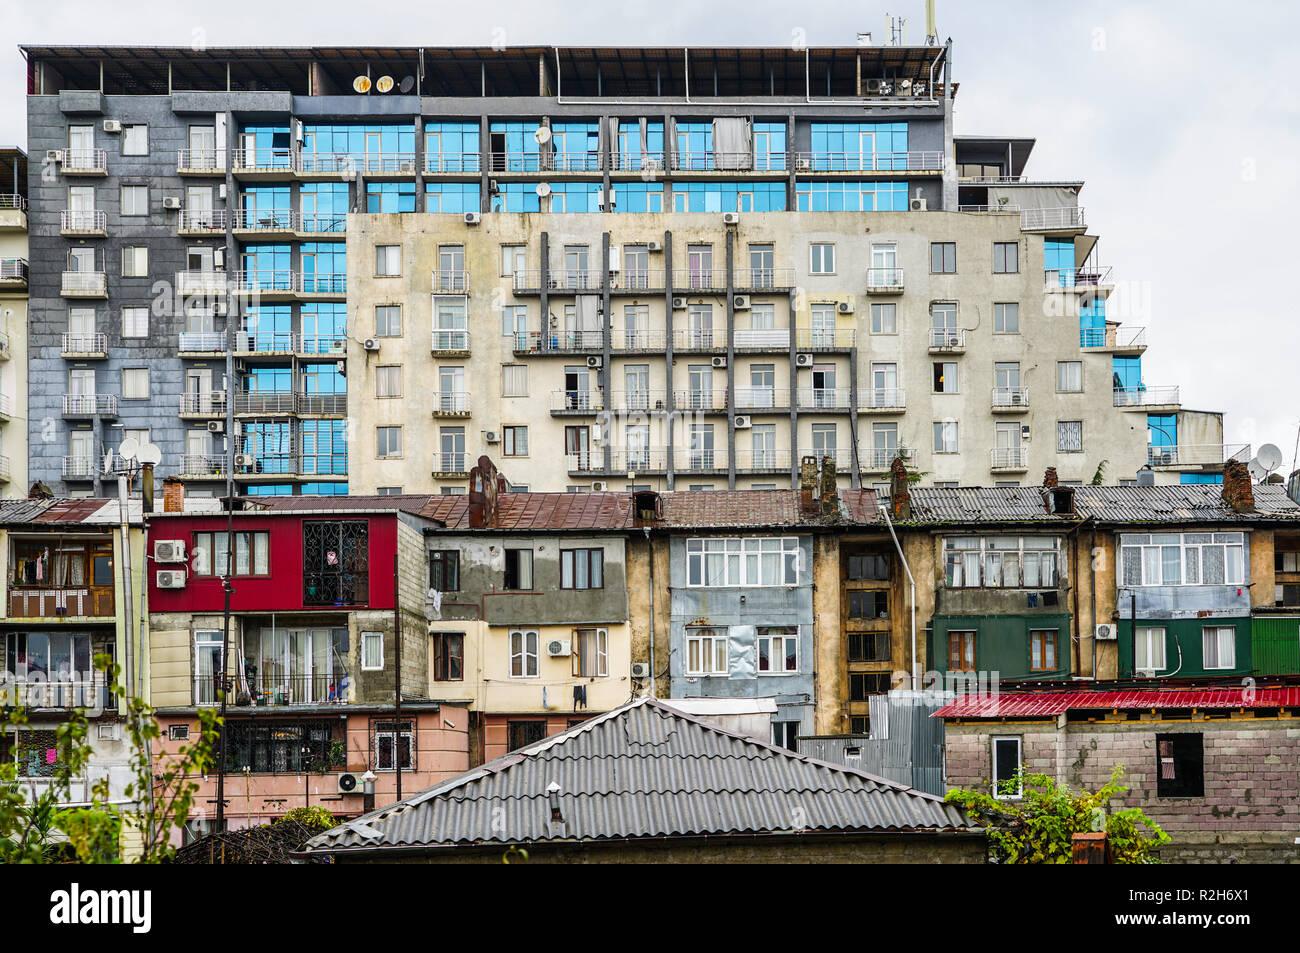 poor suburban block of flats, construction, balcony - Stock Image